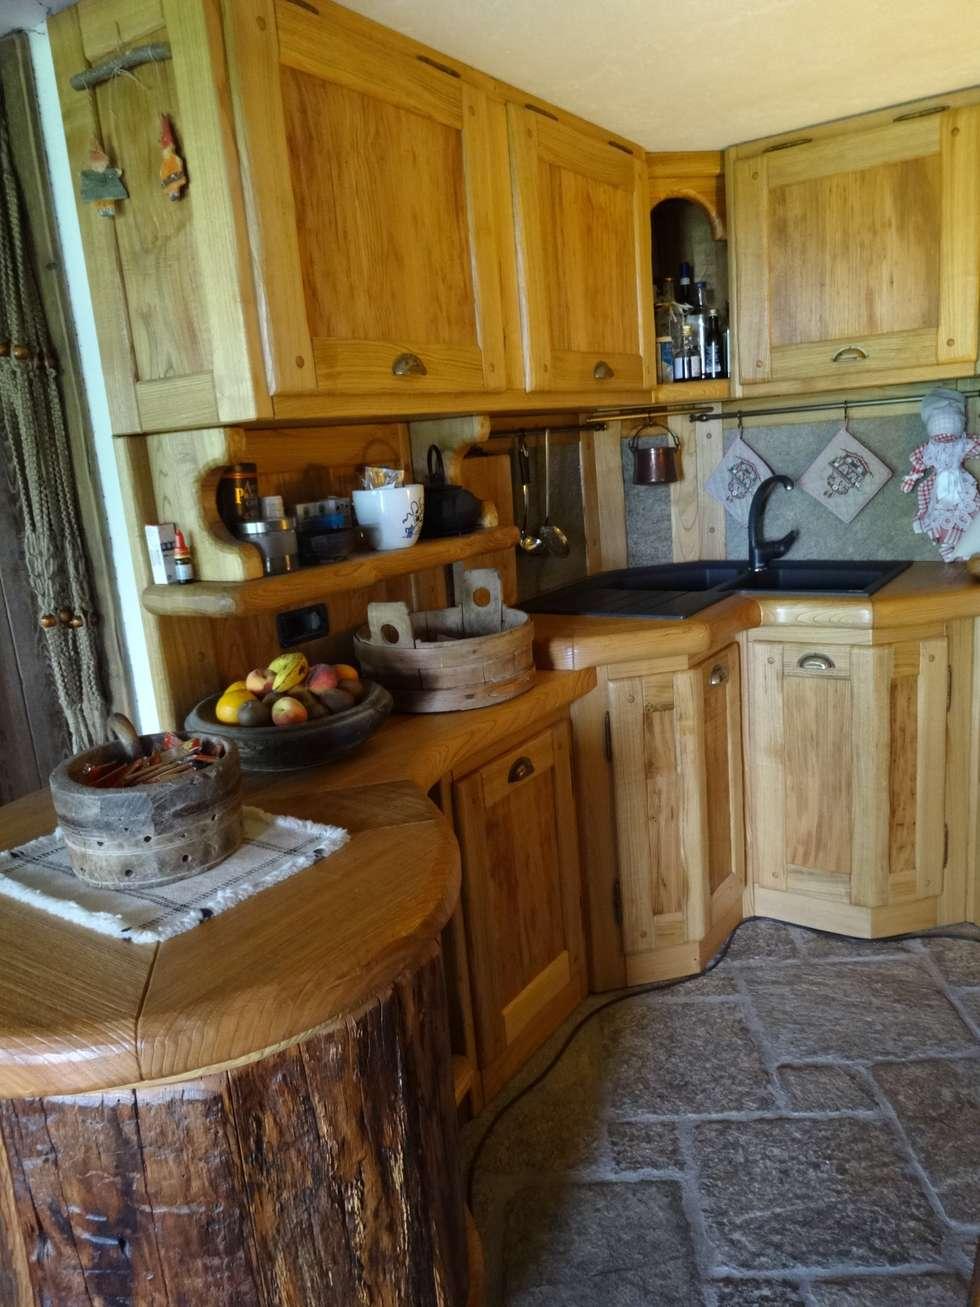 Calda cucina per baita di montagna cucina in stile in for Arredamento baita montagna